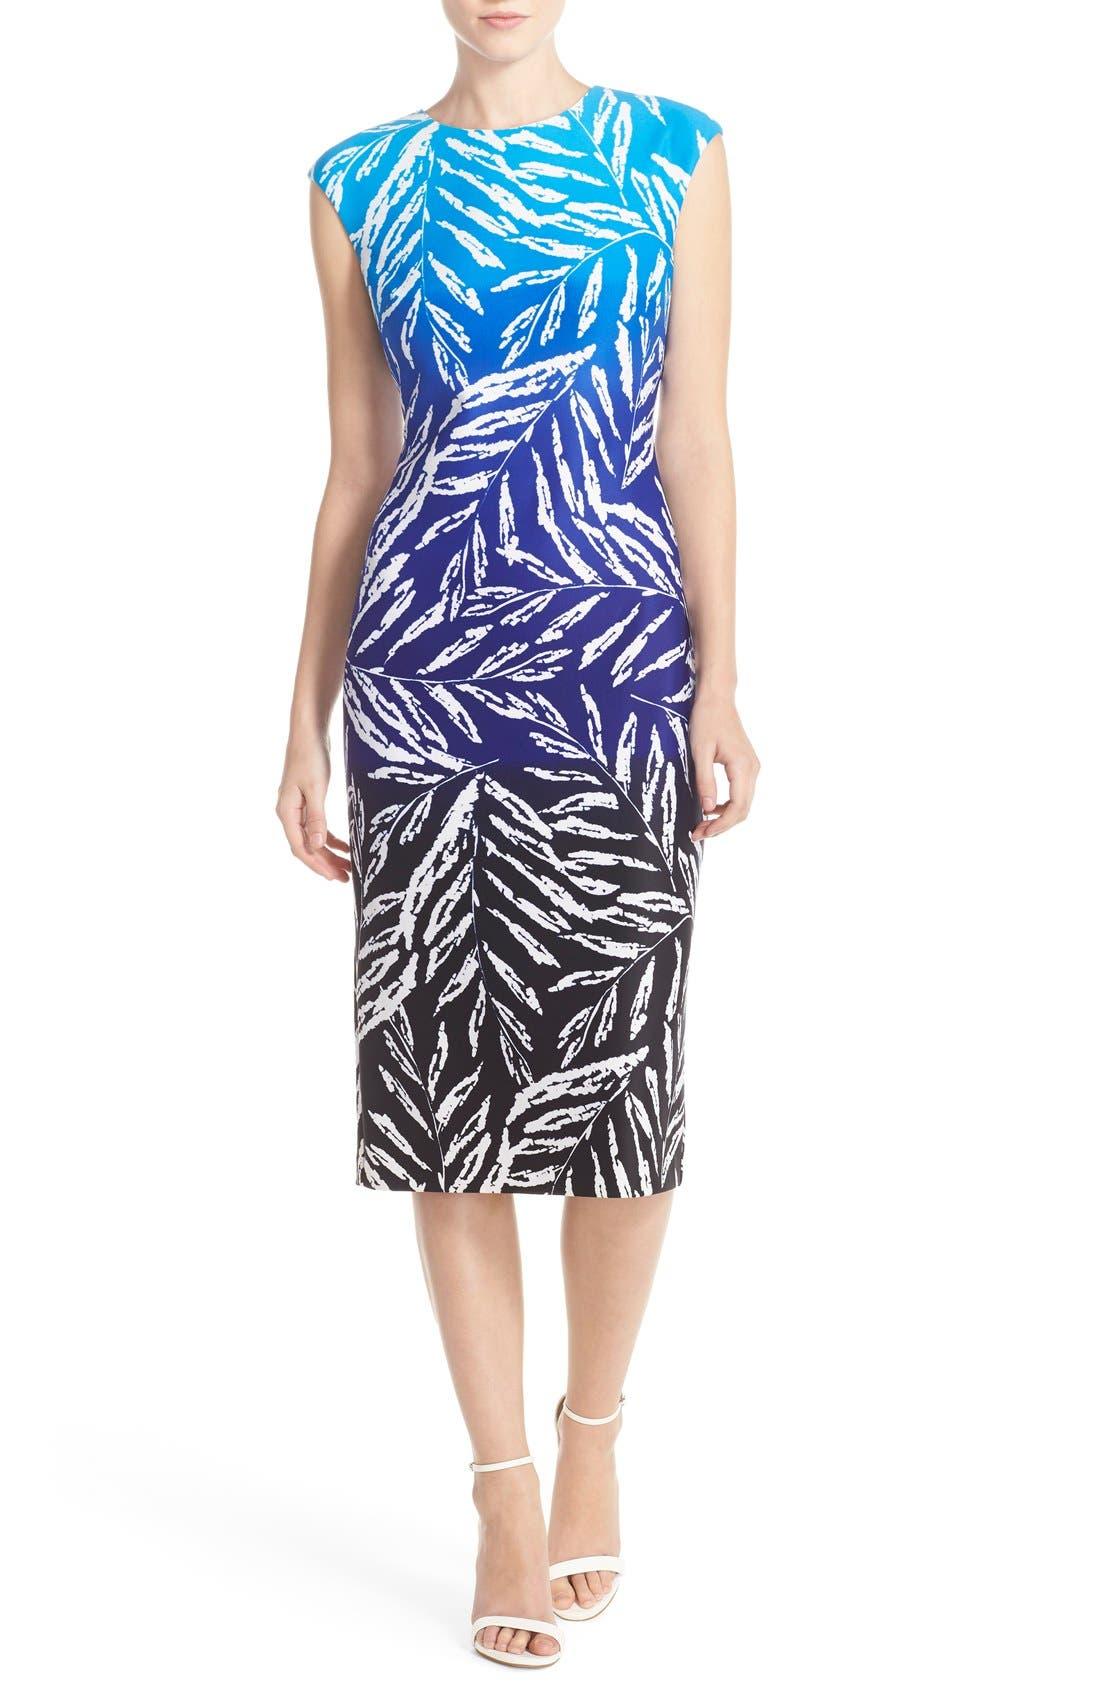 Alternate Image 1 Selected - Vince Camuto Ombré Print Stretch Scuba Midi Dress